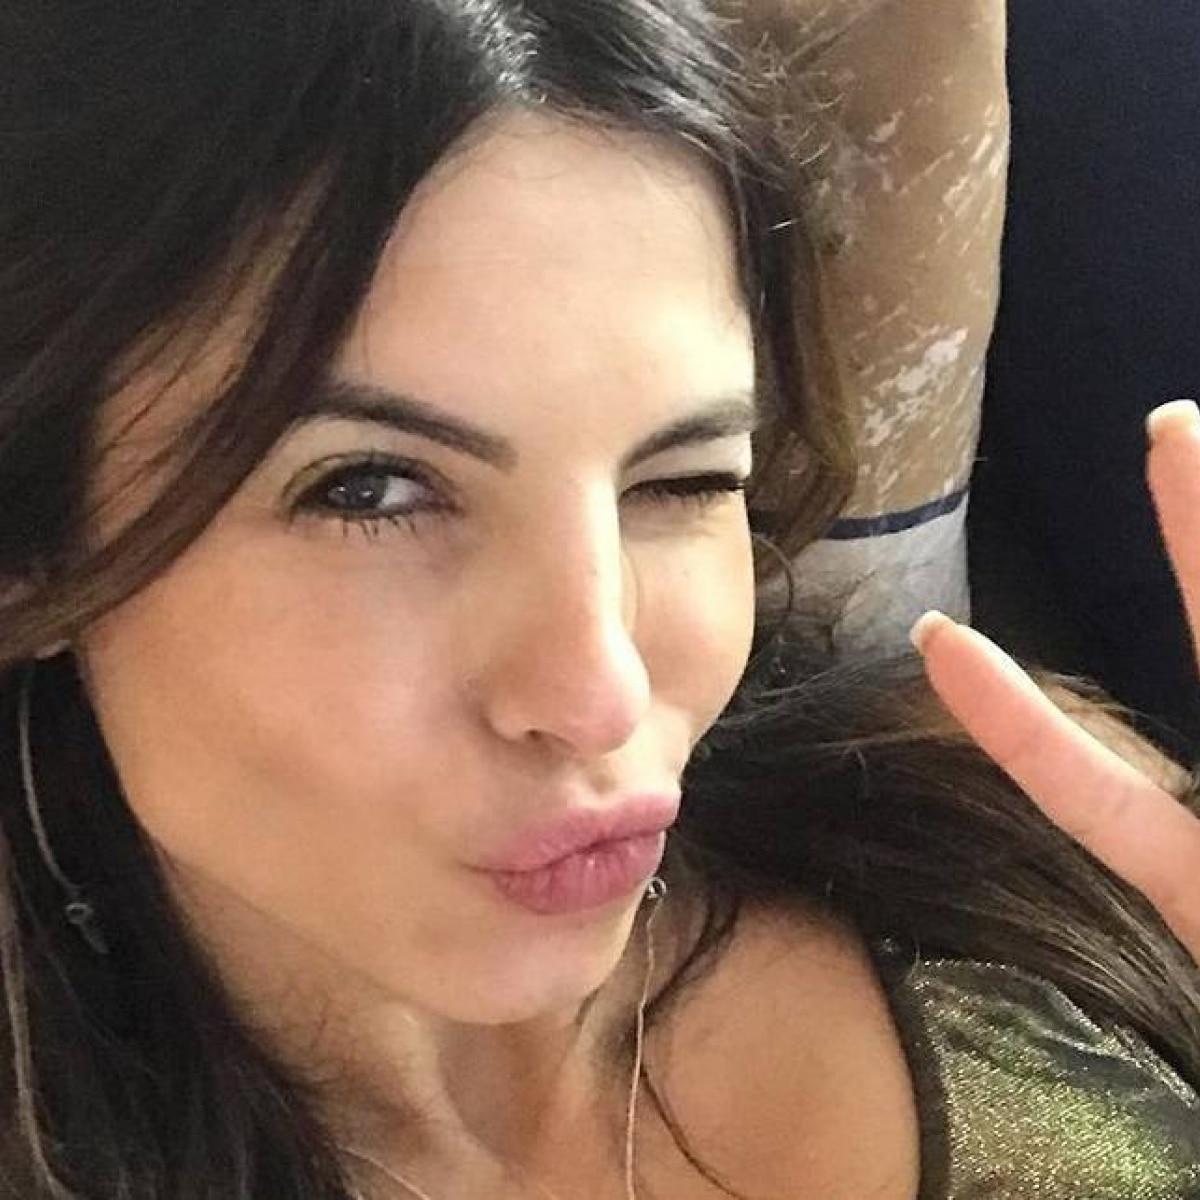 Atriz Lidi Lisboa sthefany brito estreia em 'jezabel', s�rie da record tv